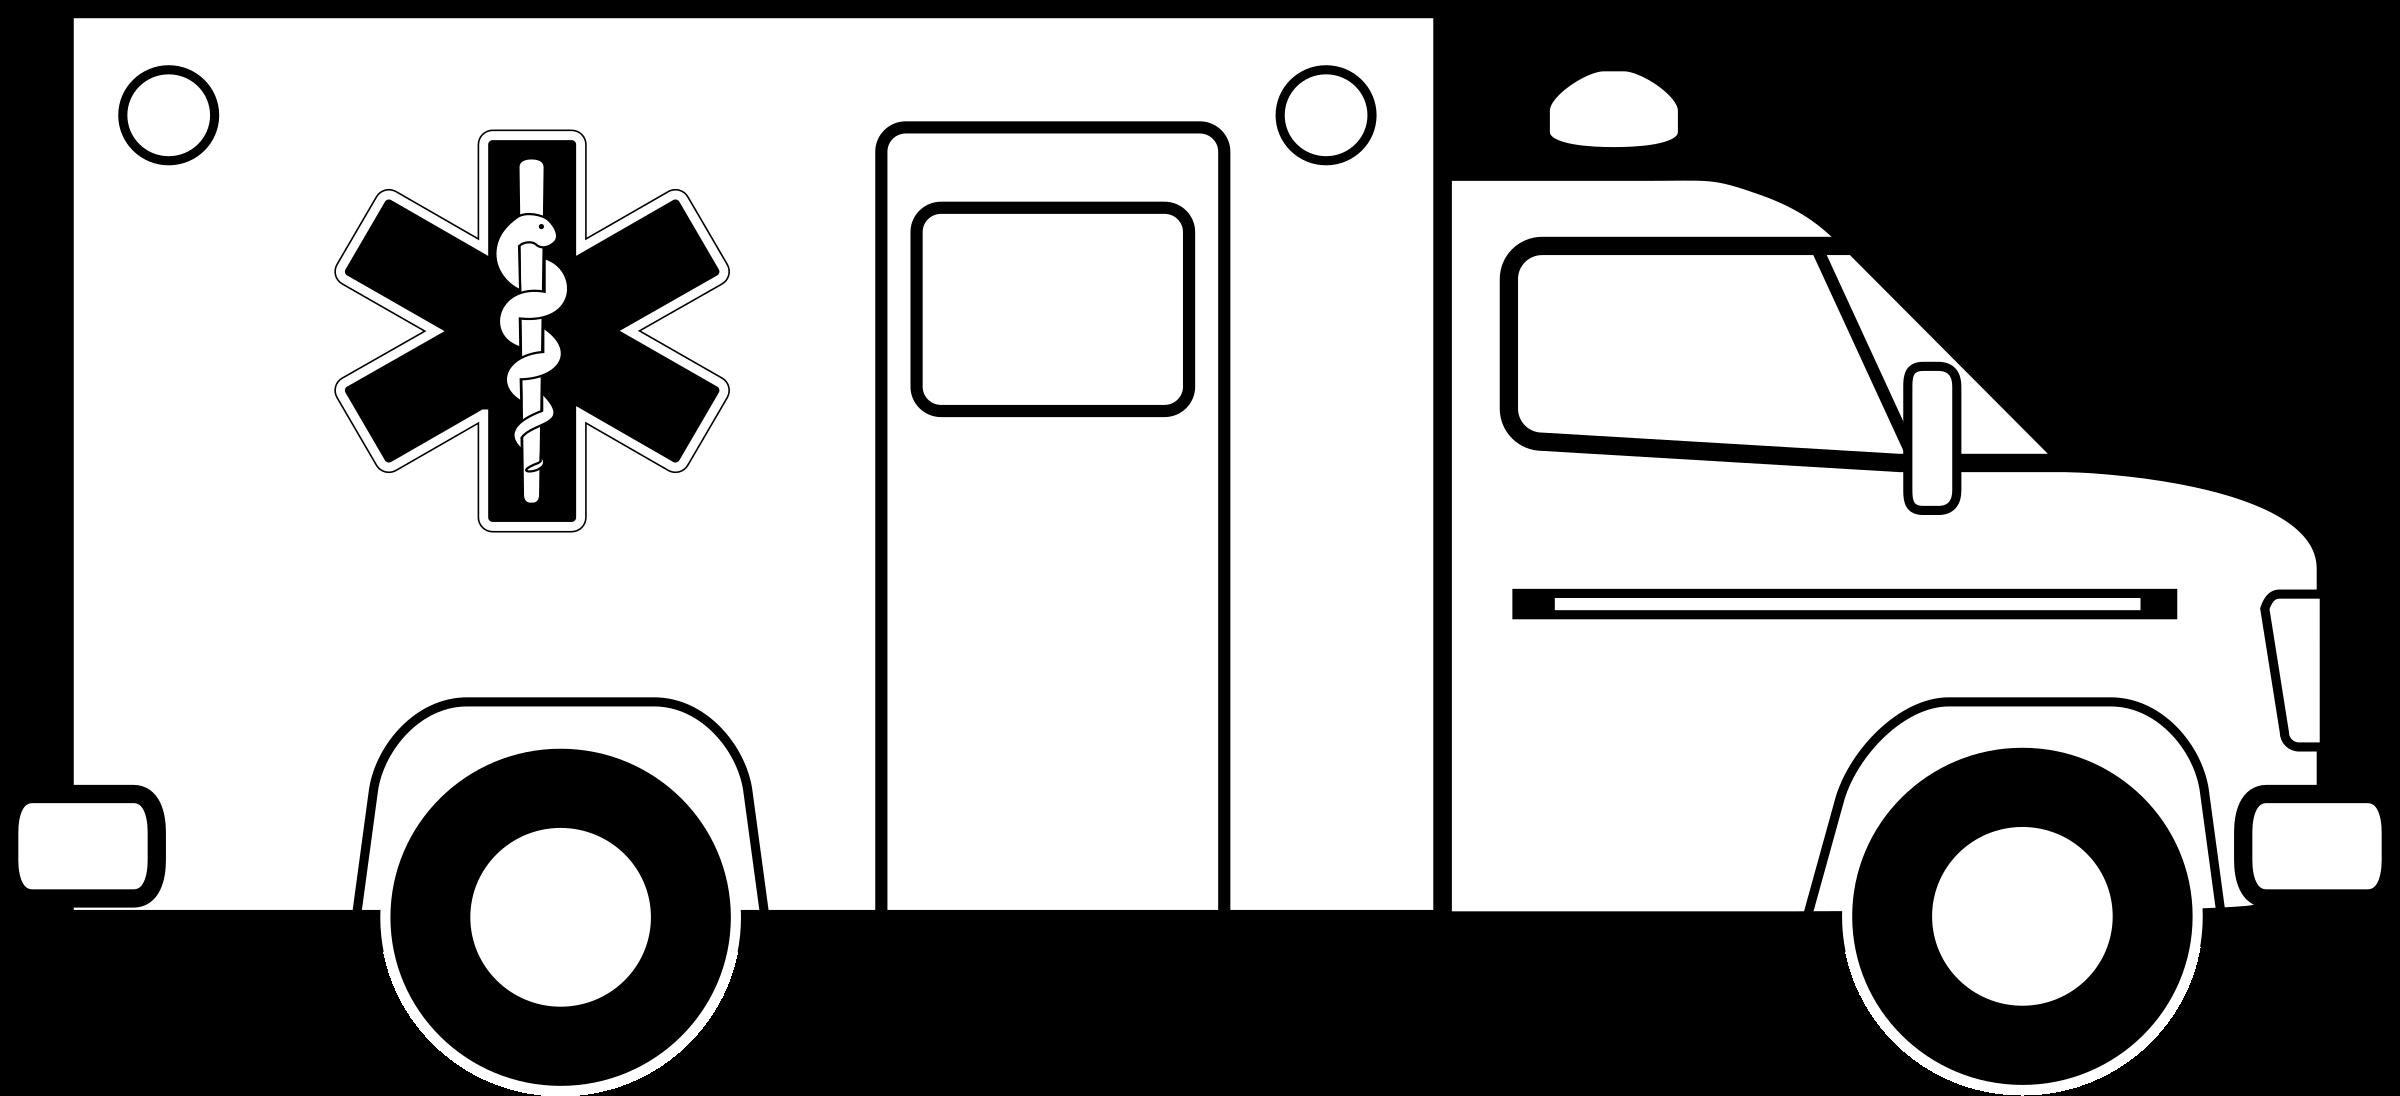 Clipart images ambulance. Big image png